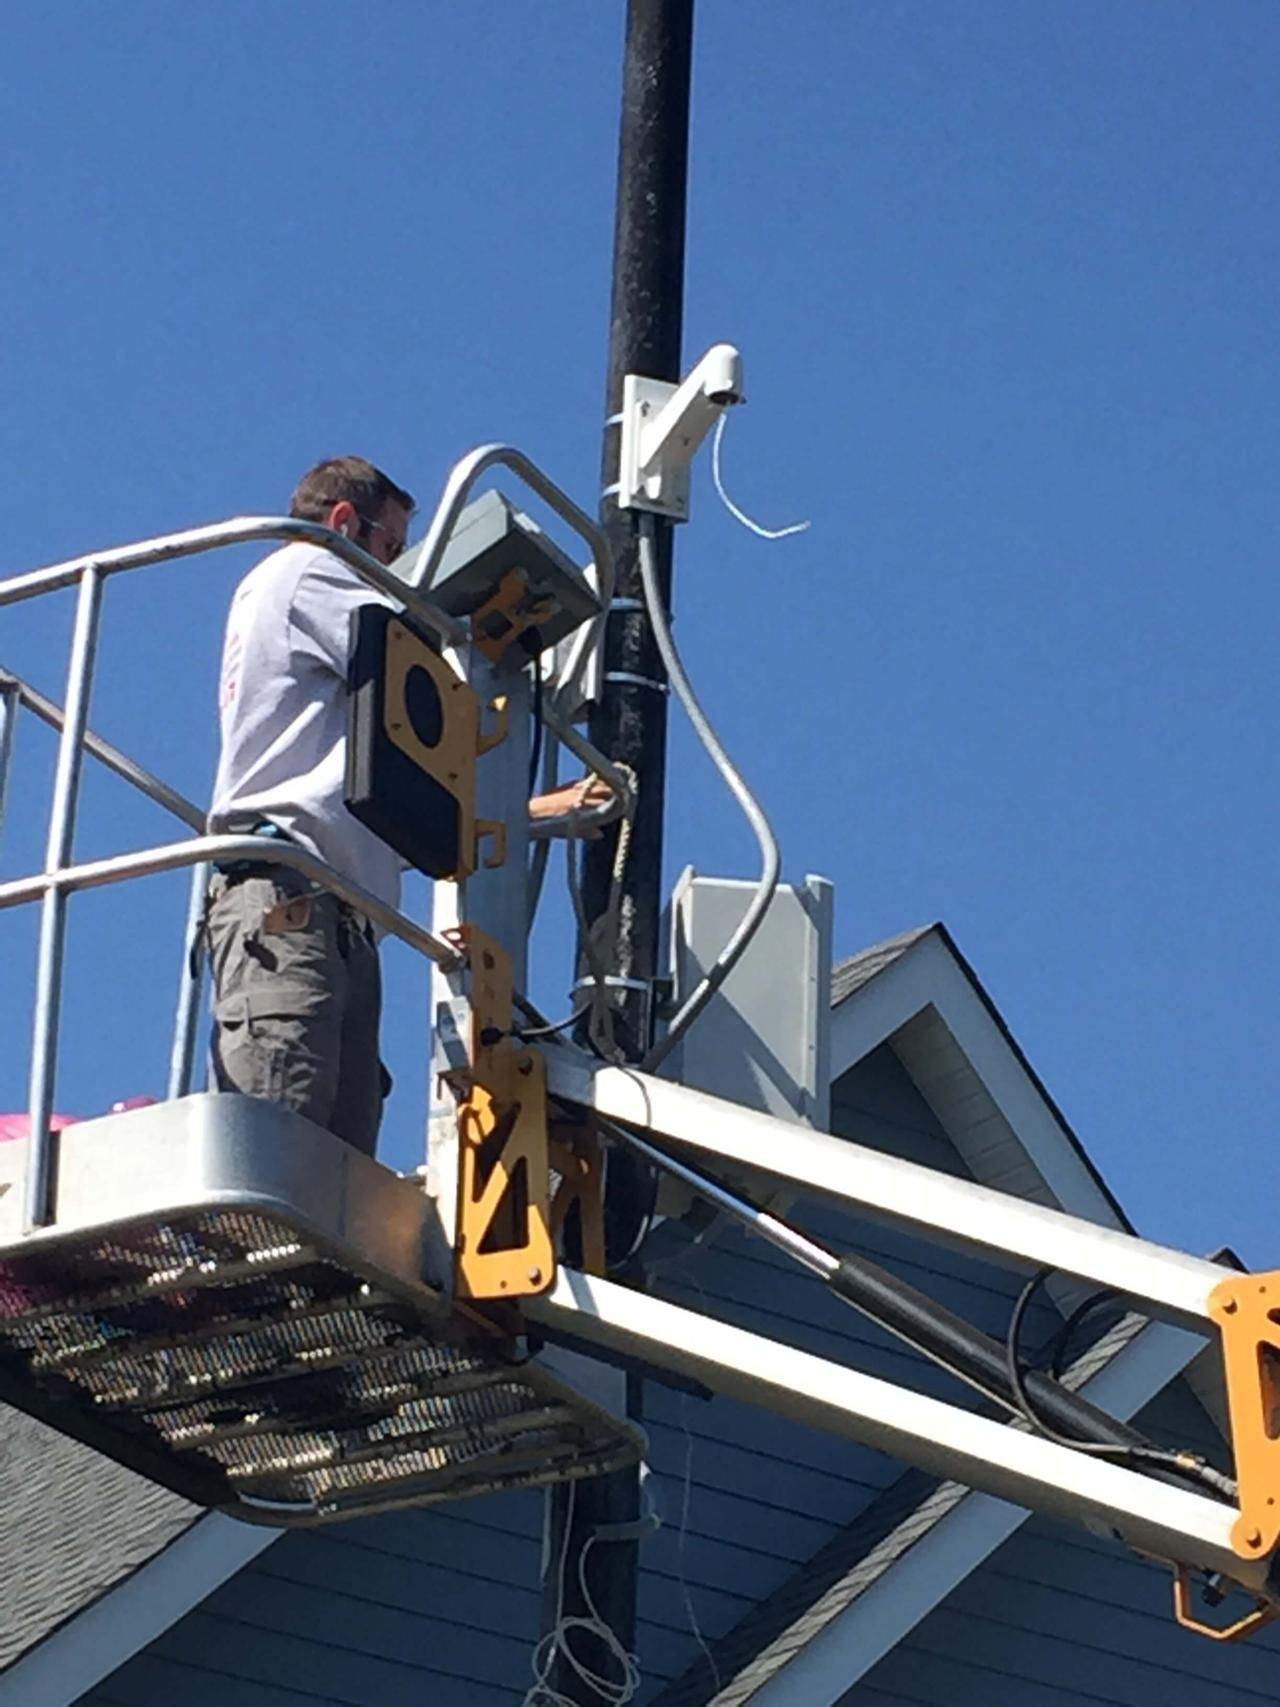 security camera installation nassau county